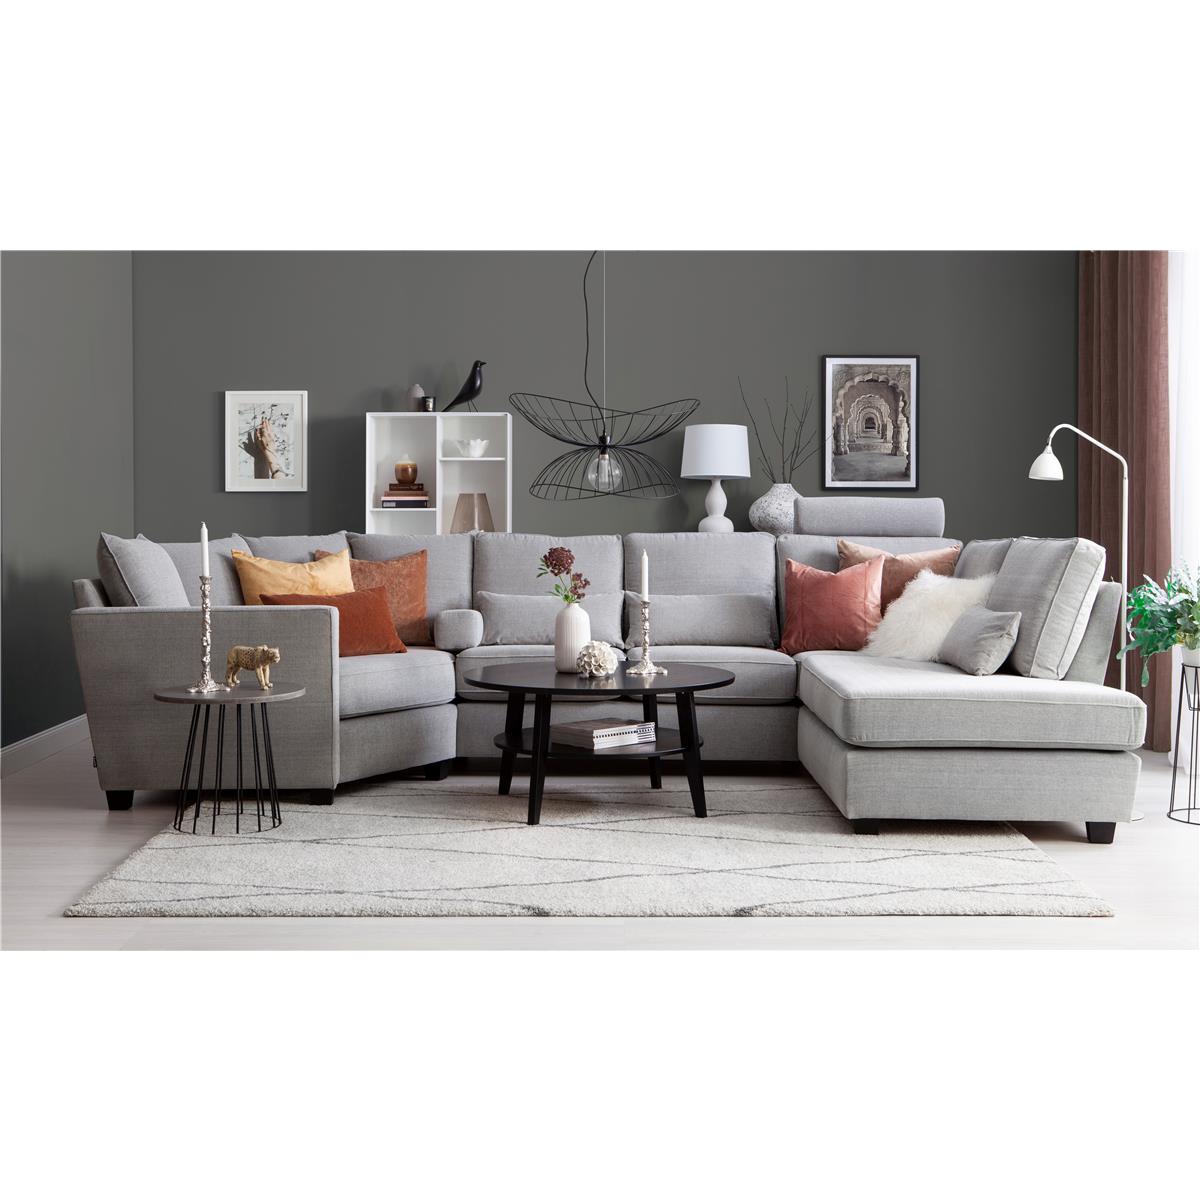 Daily soffa kombination miljö